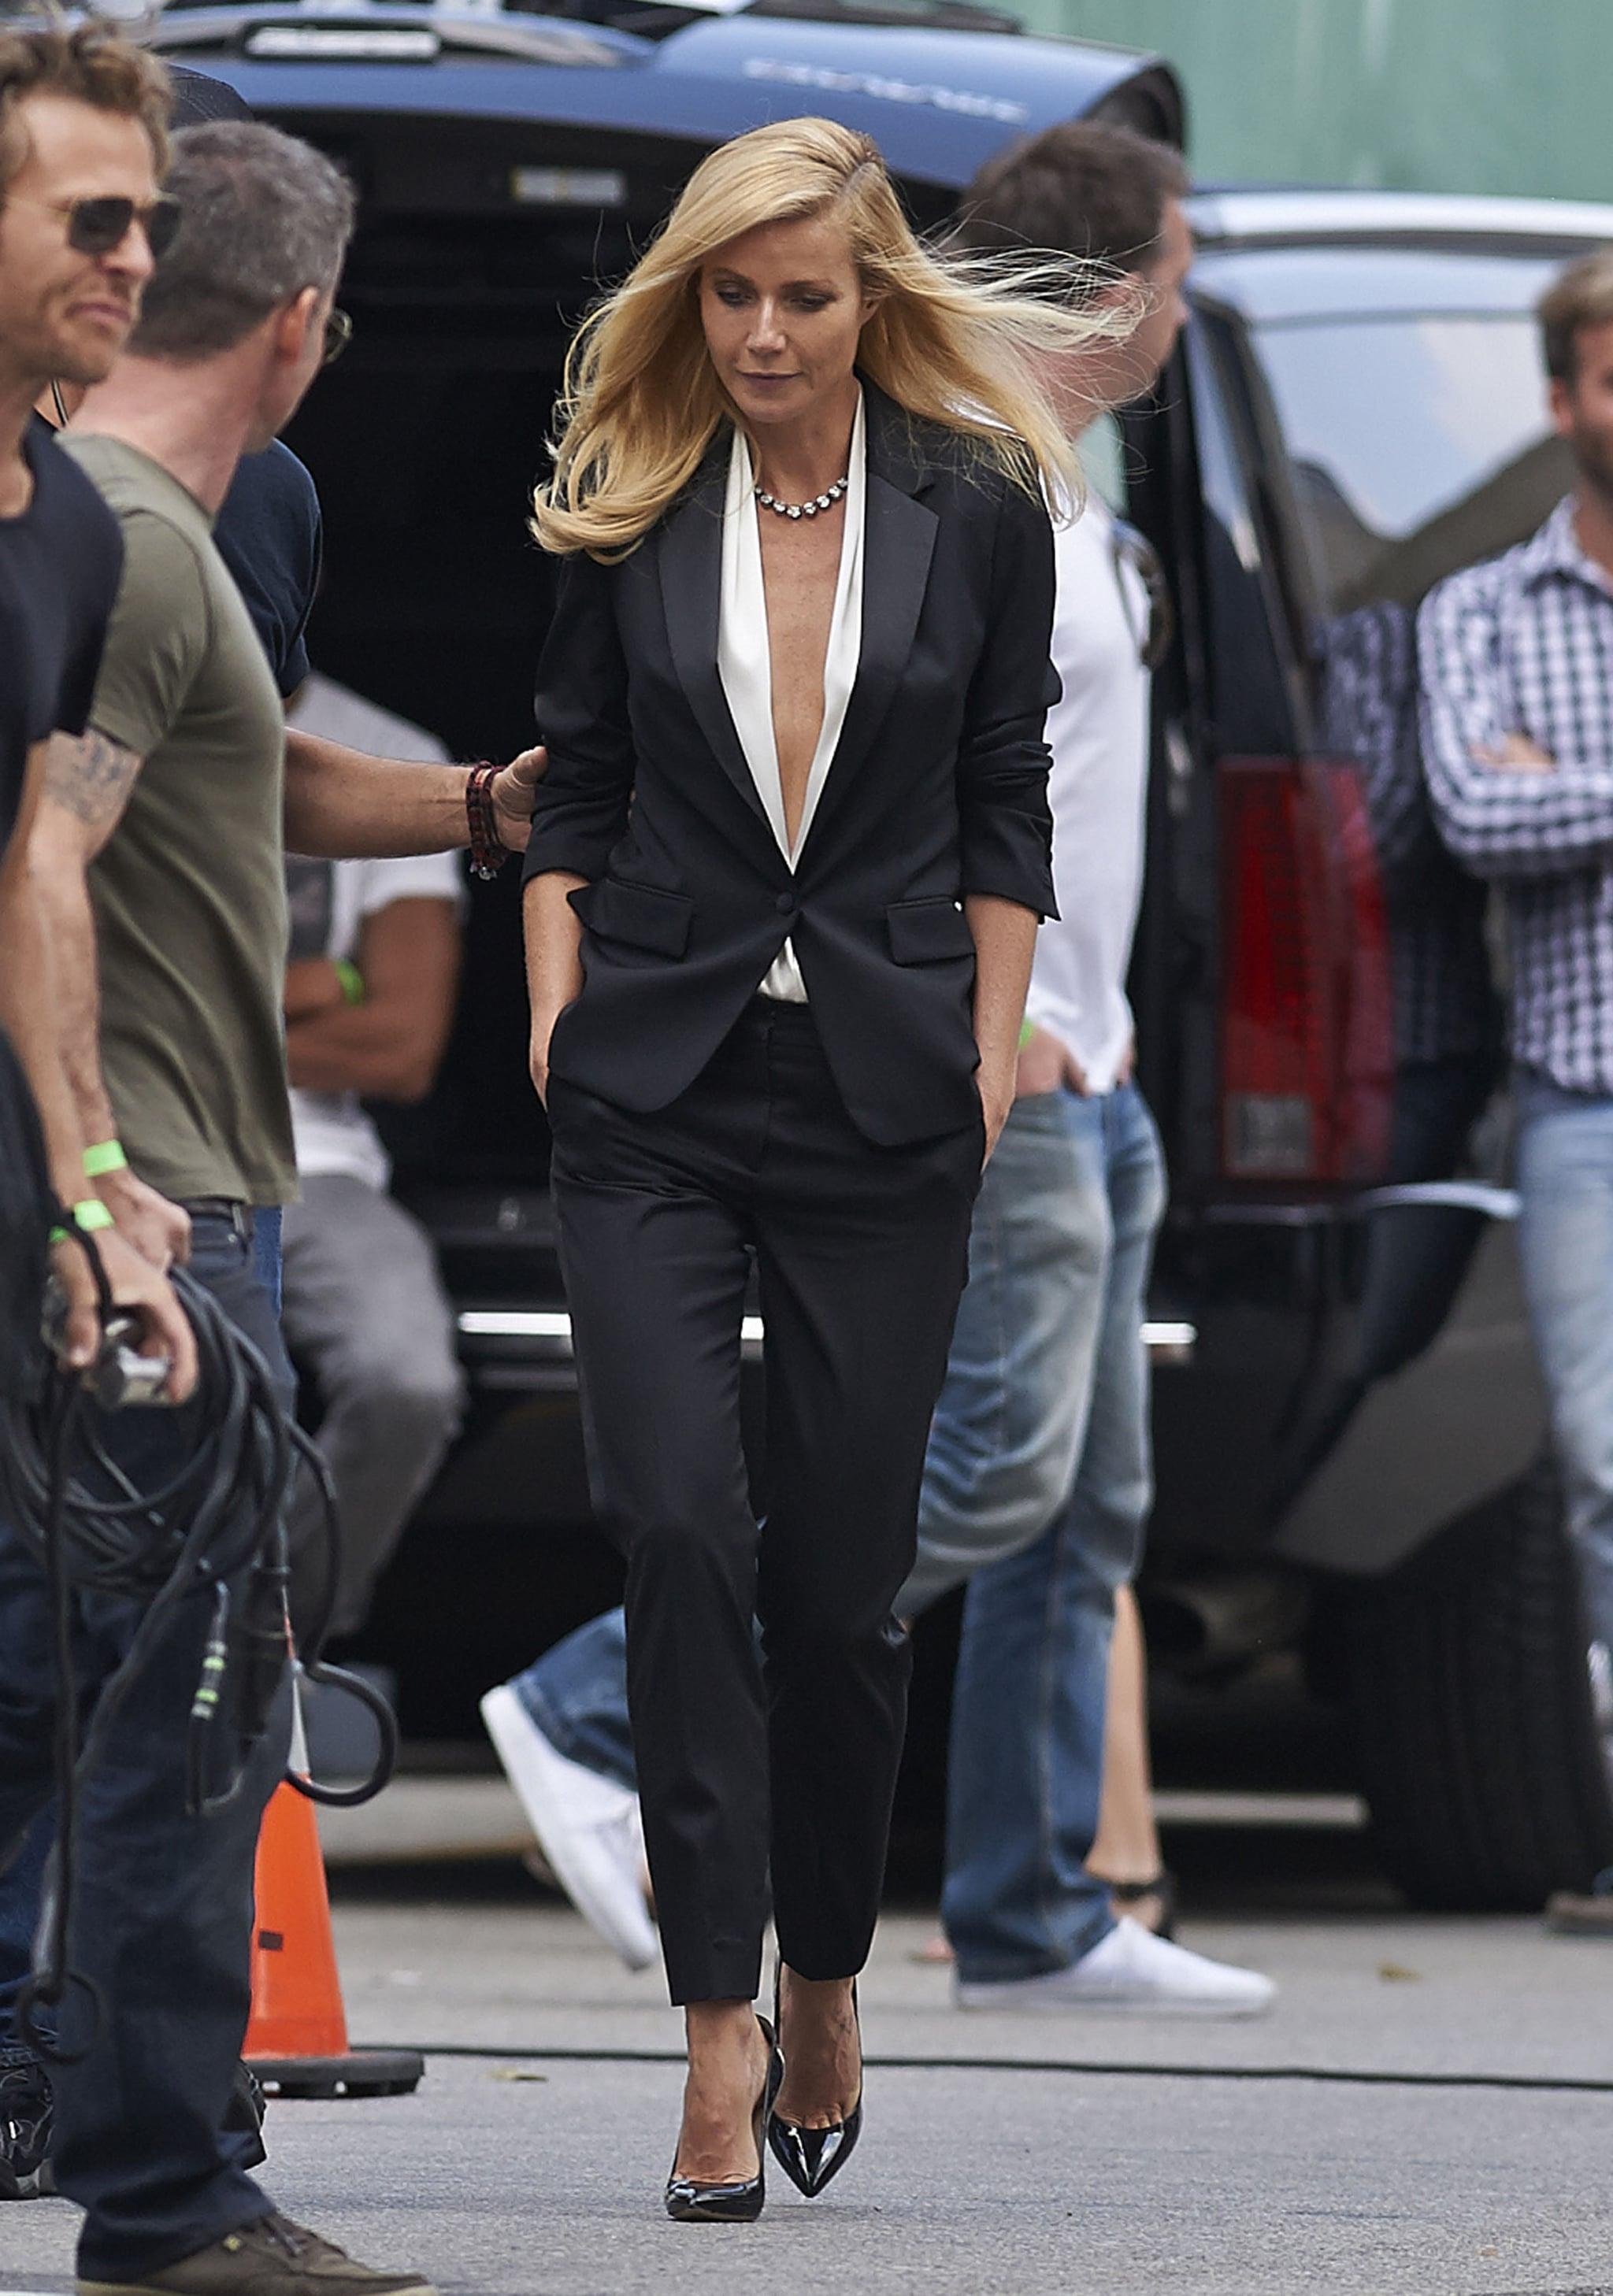 Gwyneth Paltrow filmed her new Hugo Boss ad in LA.